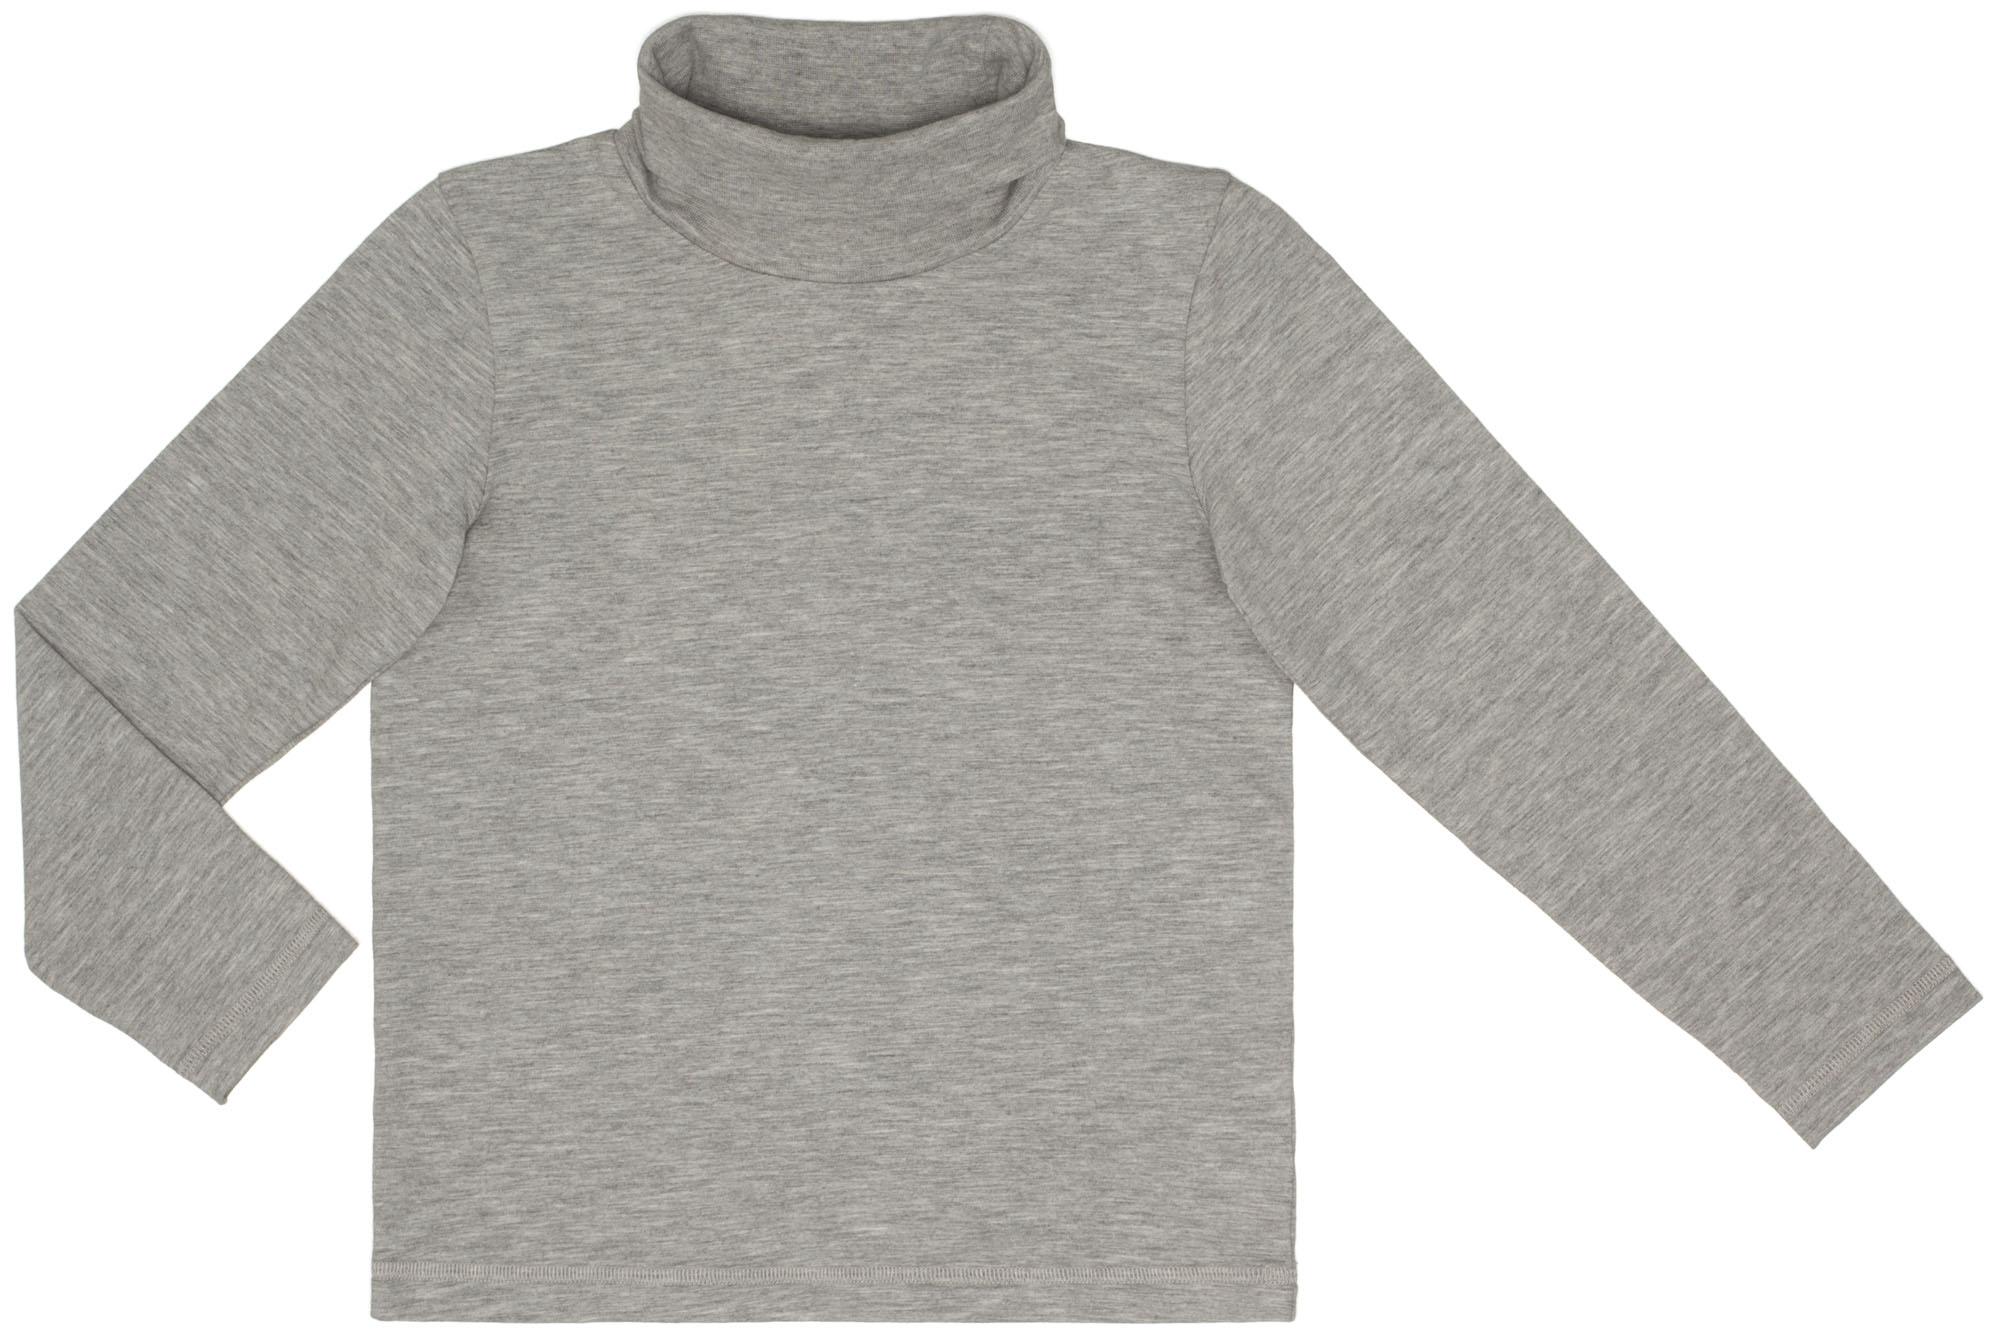 Купить Водолазки, Водолазка для мальчика Спорт Barkito серый меланж, Узбекистан, Мужской